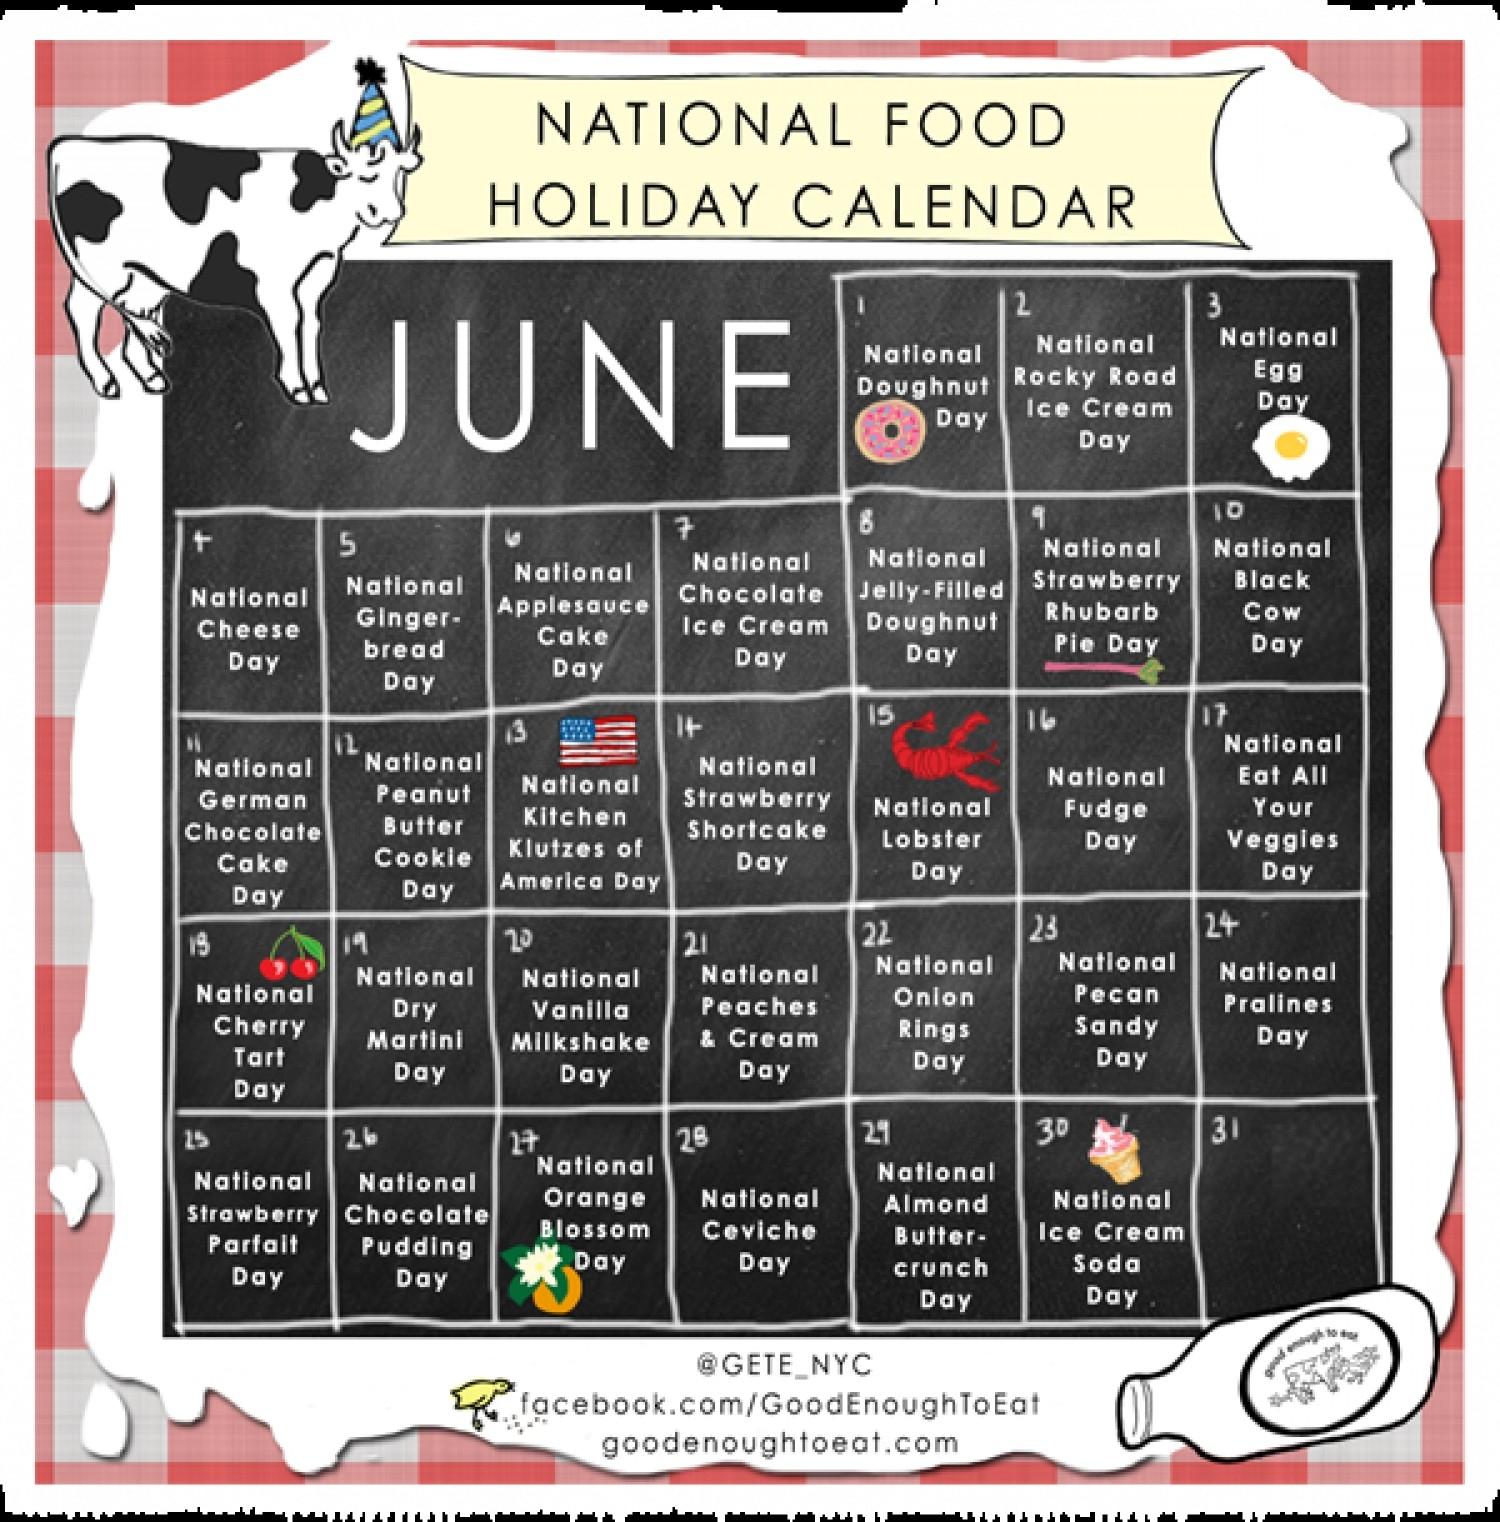 National Food Holiday Calendar - June 2013 | Visual.ly-Calender For Food Holidays